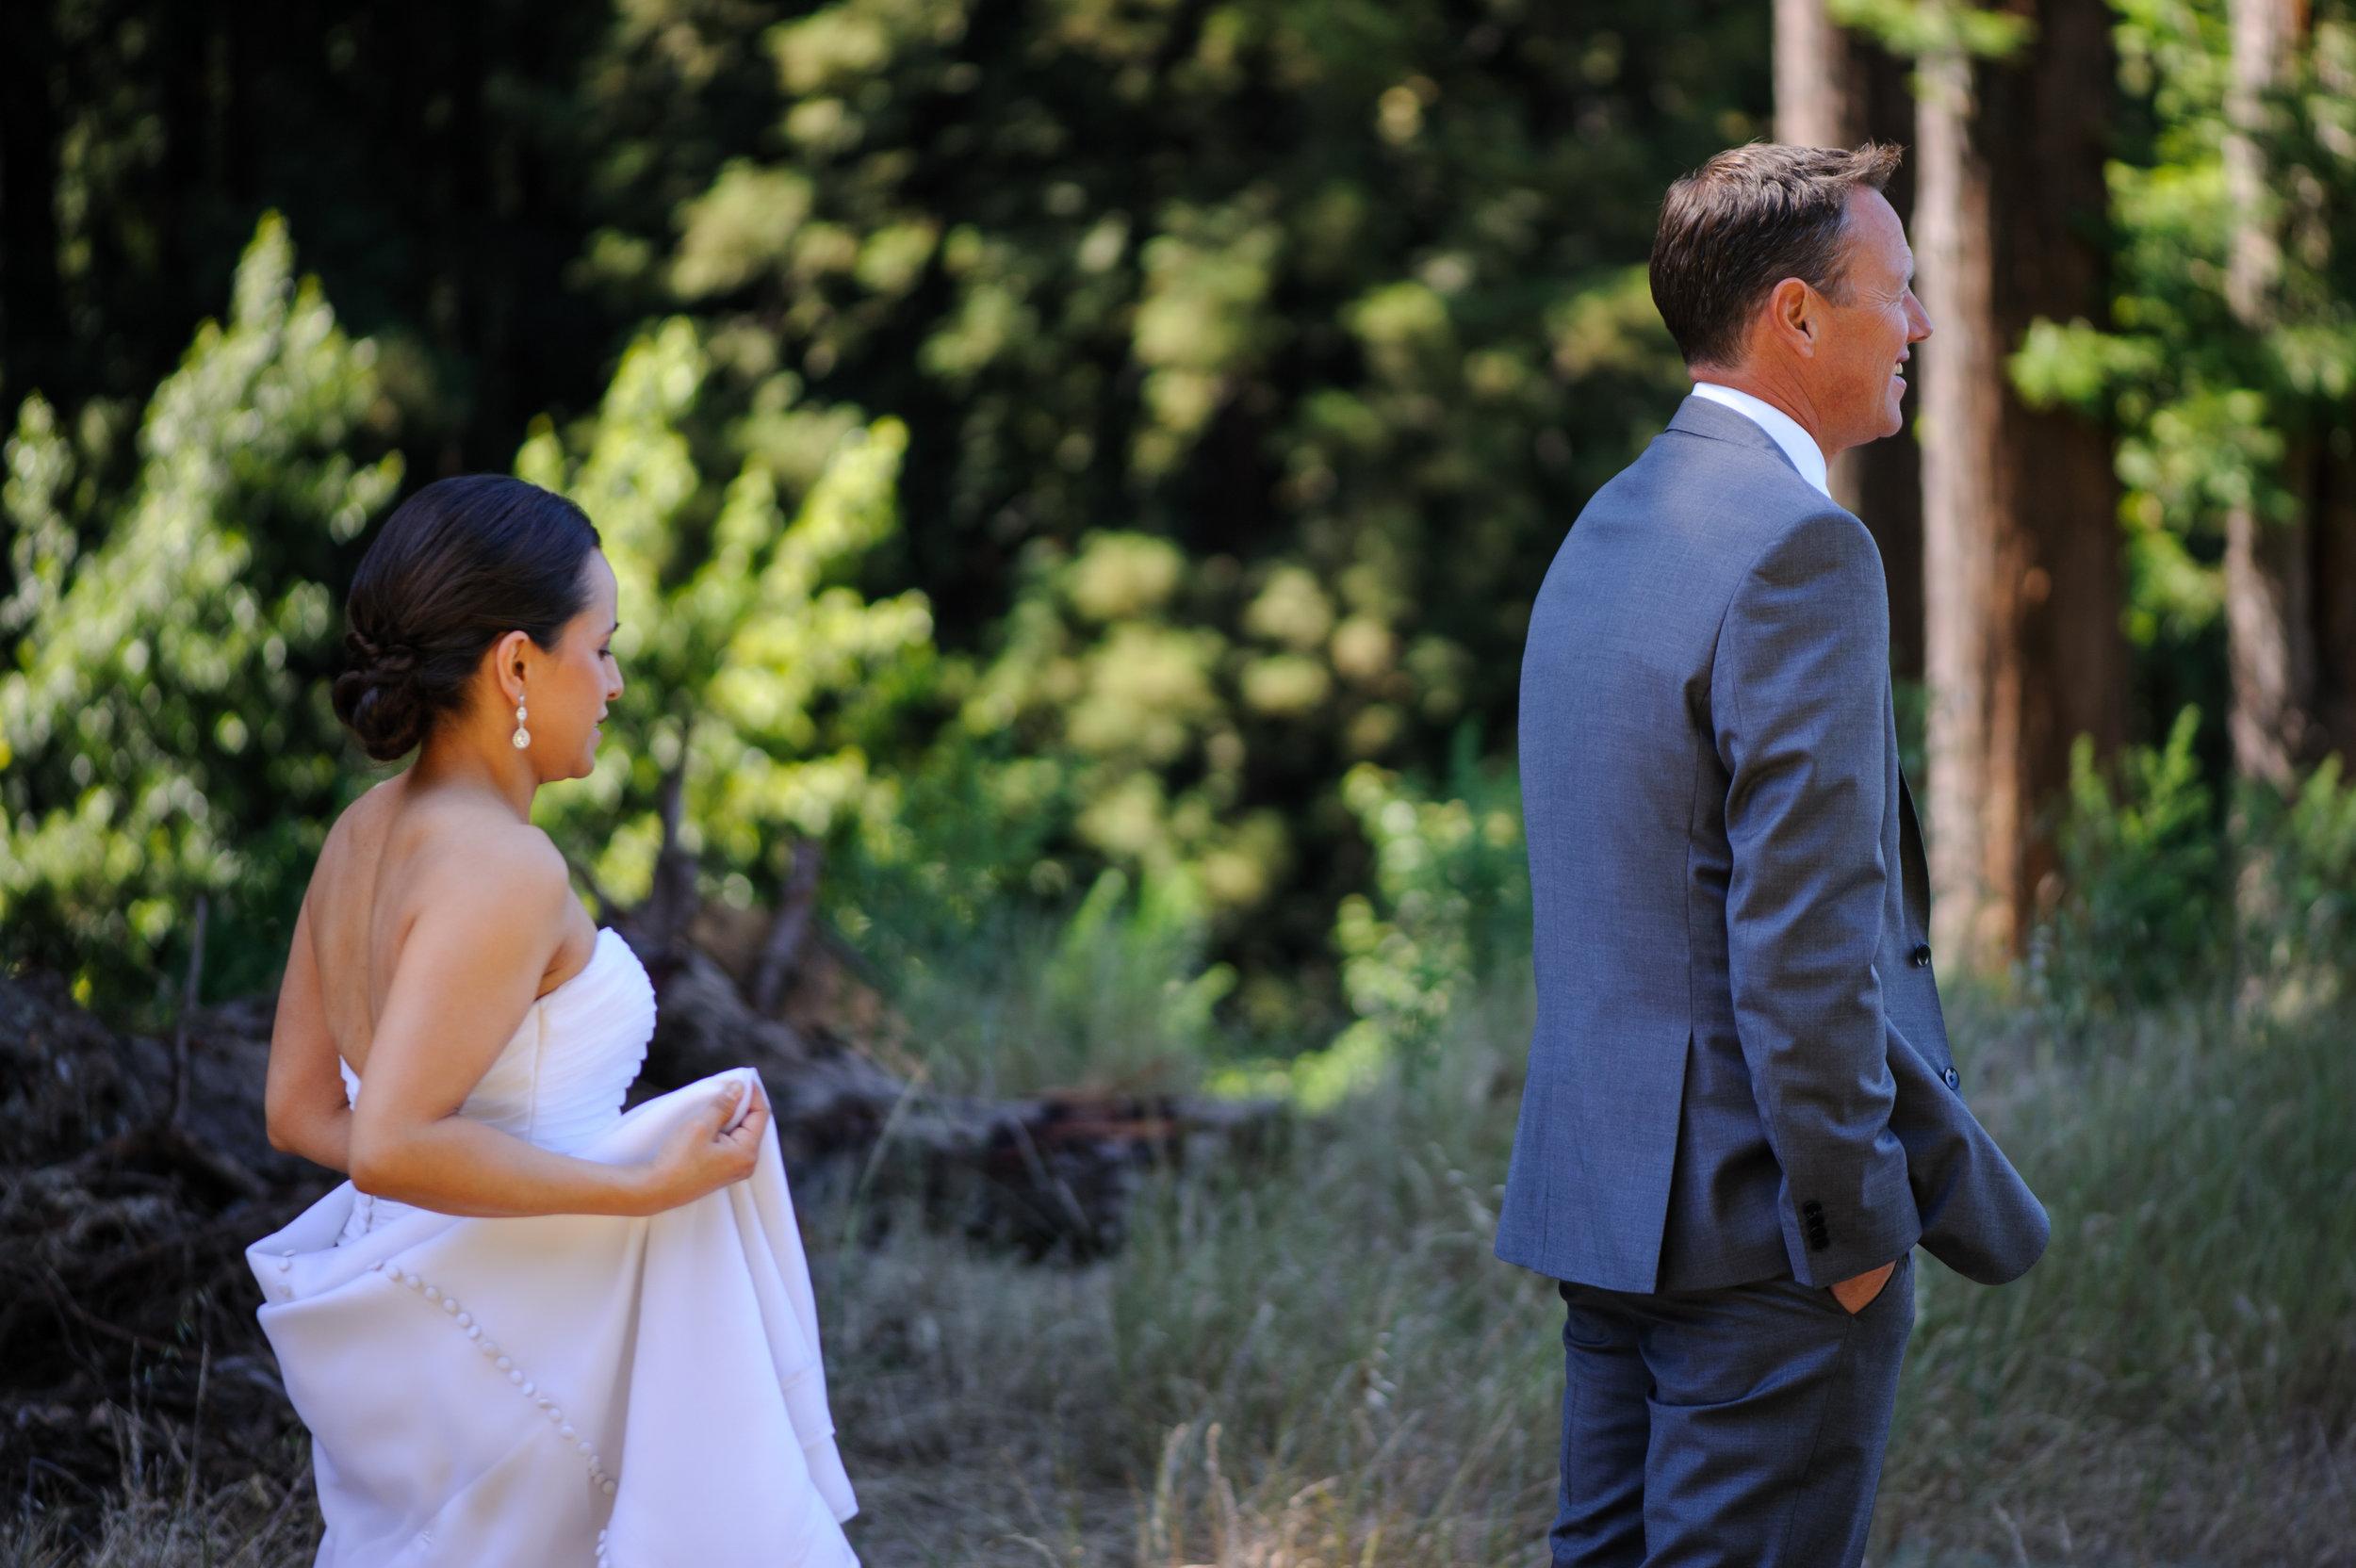 janet-jeremy-004-mountain-terrace-woodside-wedding-photographer-katherine-nicole-photography.JPG